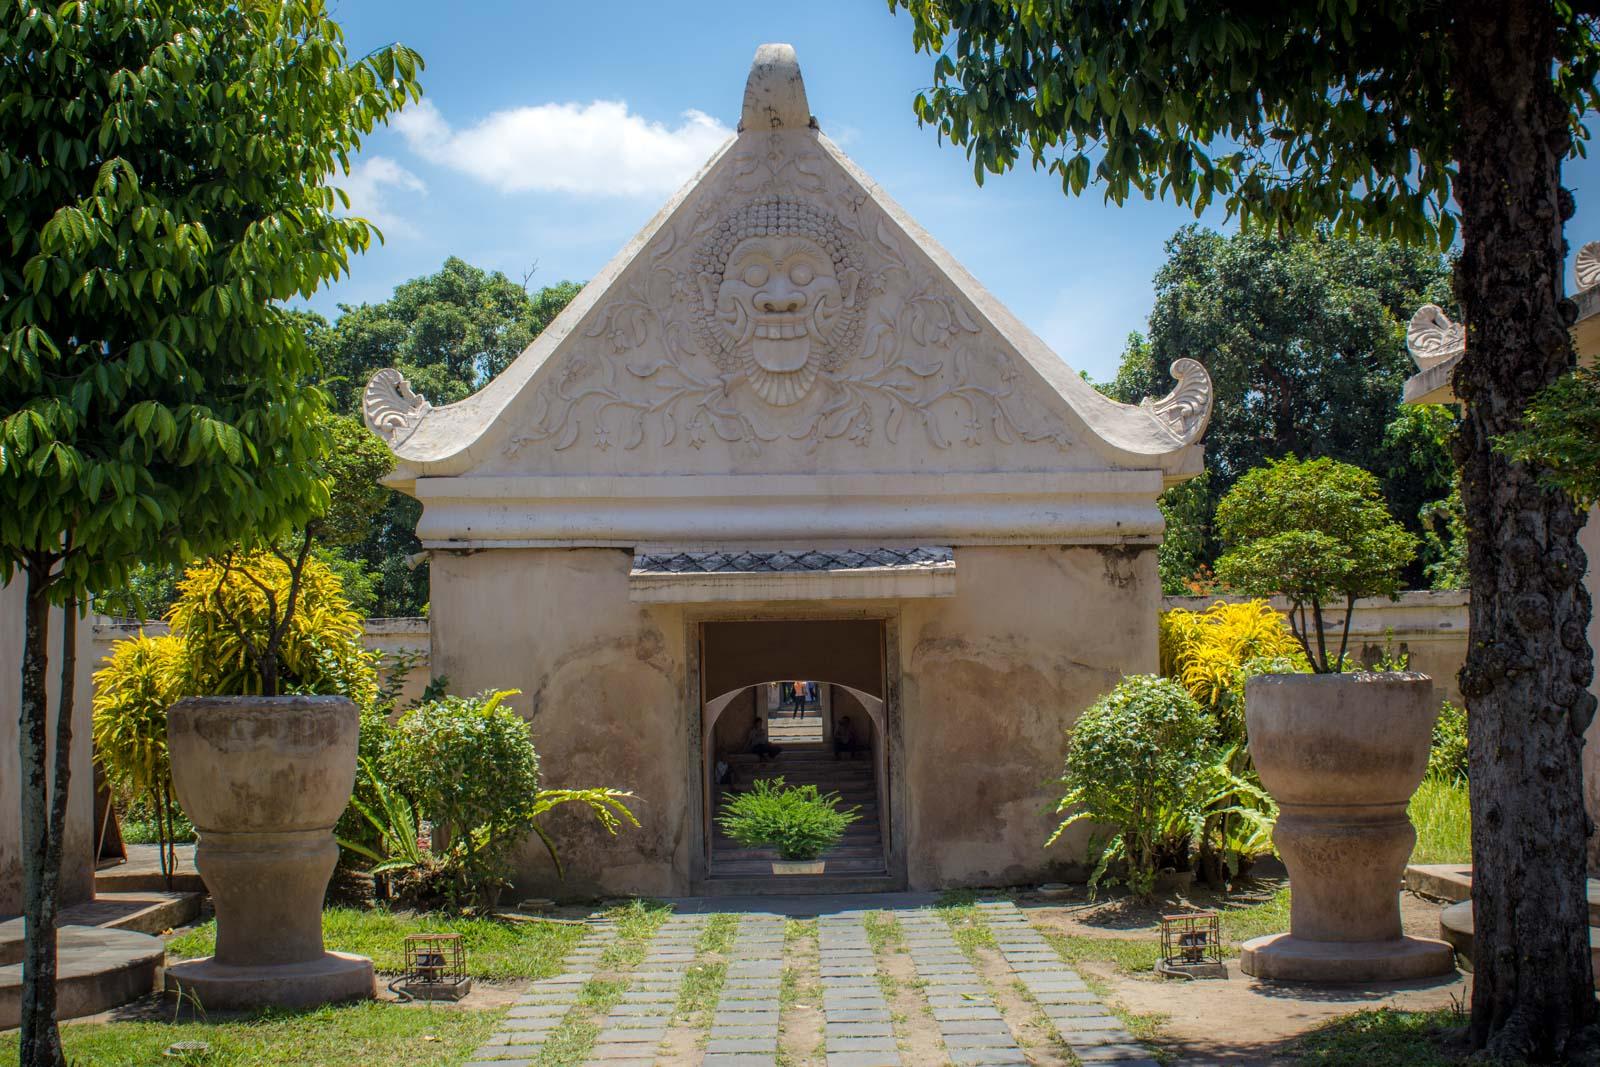 Taman Sari Water Palace, Yogyakarta, Indonesia